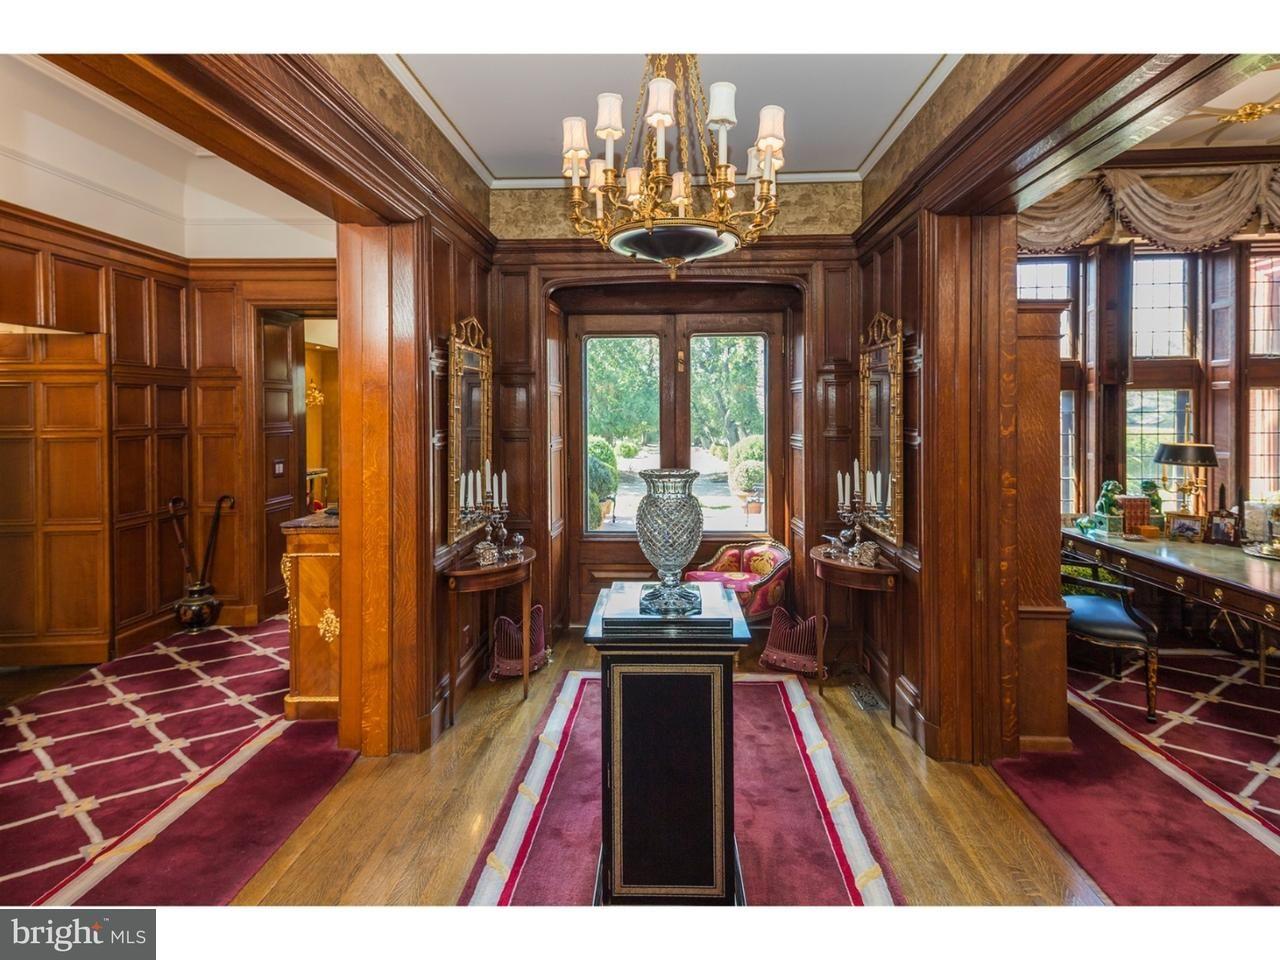 2 constitution hill e princeton nj mansions for sale